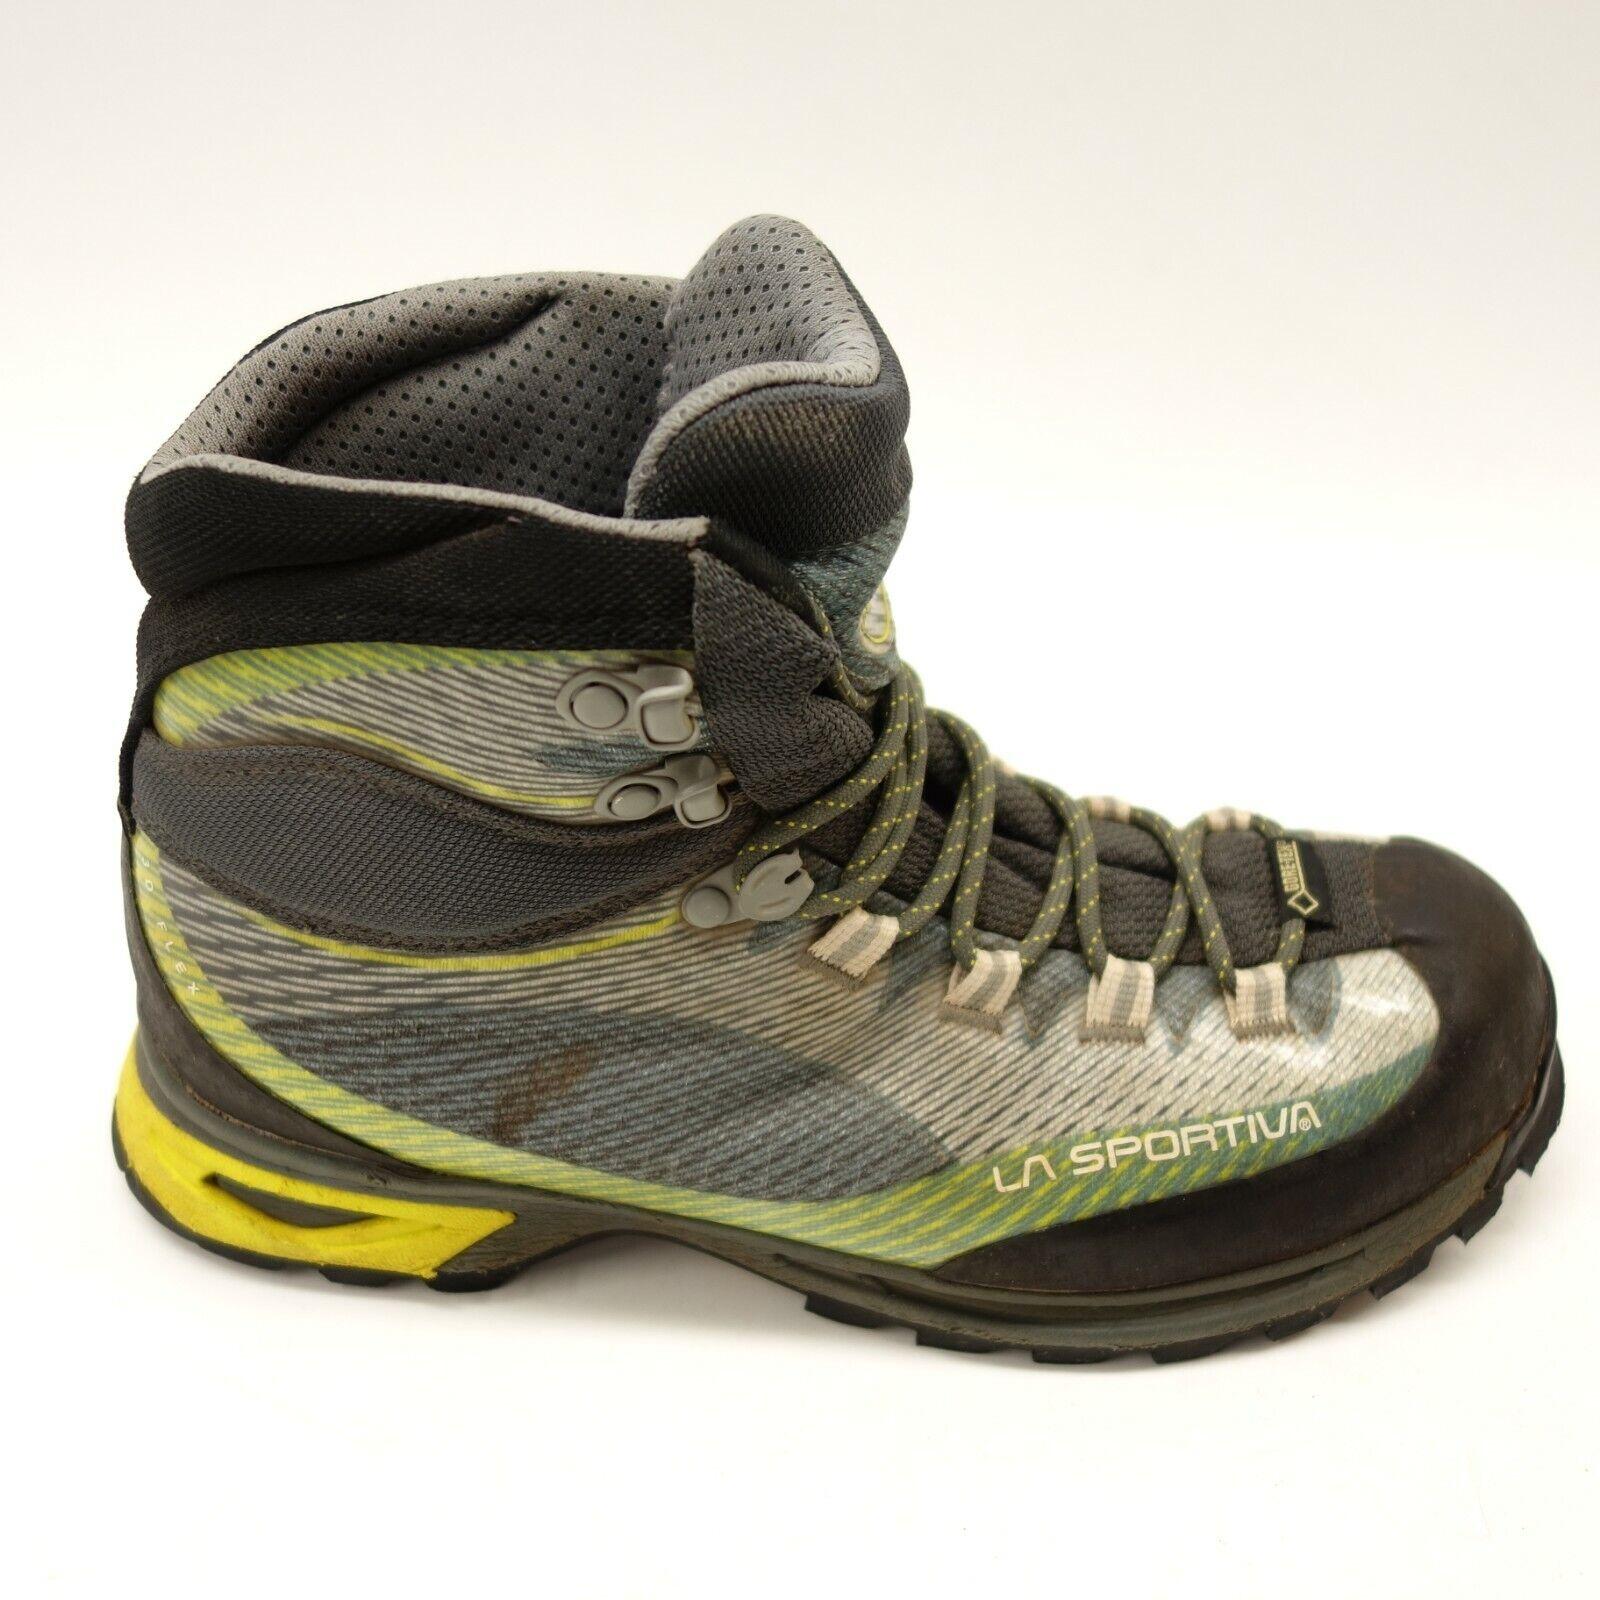 La Sportiva Womens Size US 7.5 Trango TRK GTX WP Mountaineering Boots